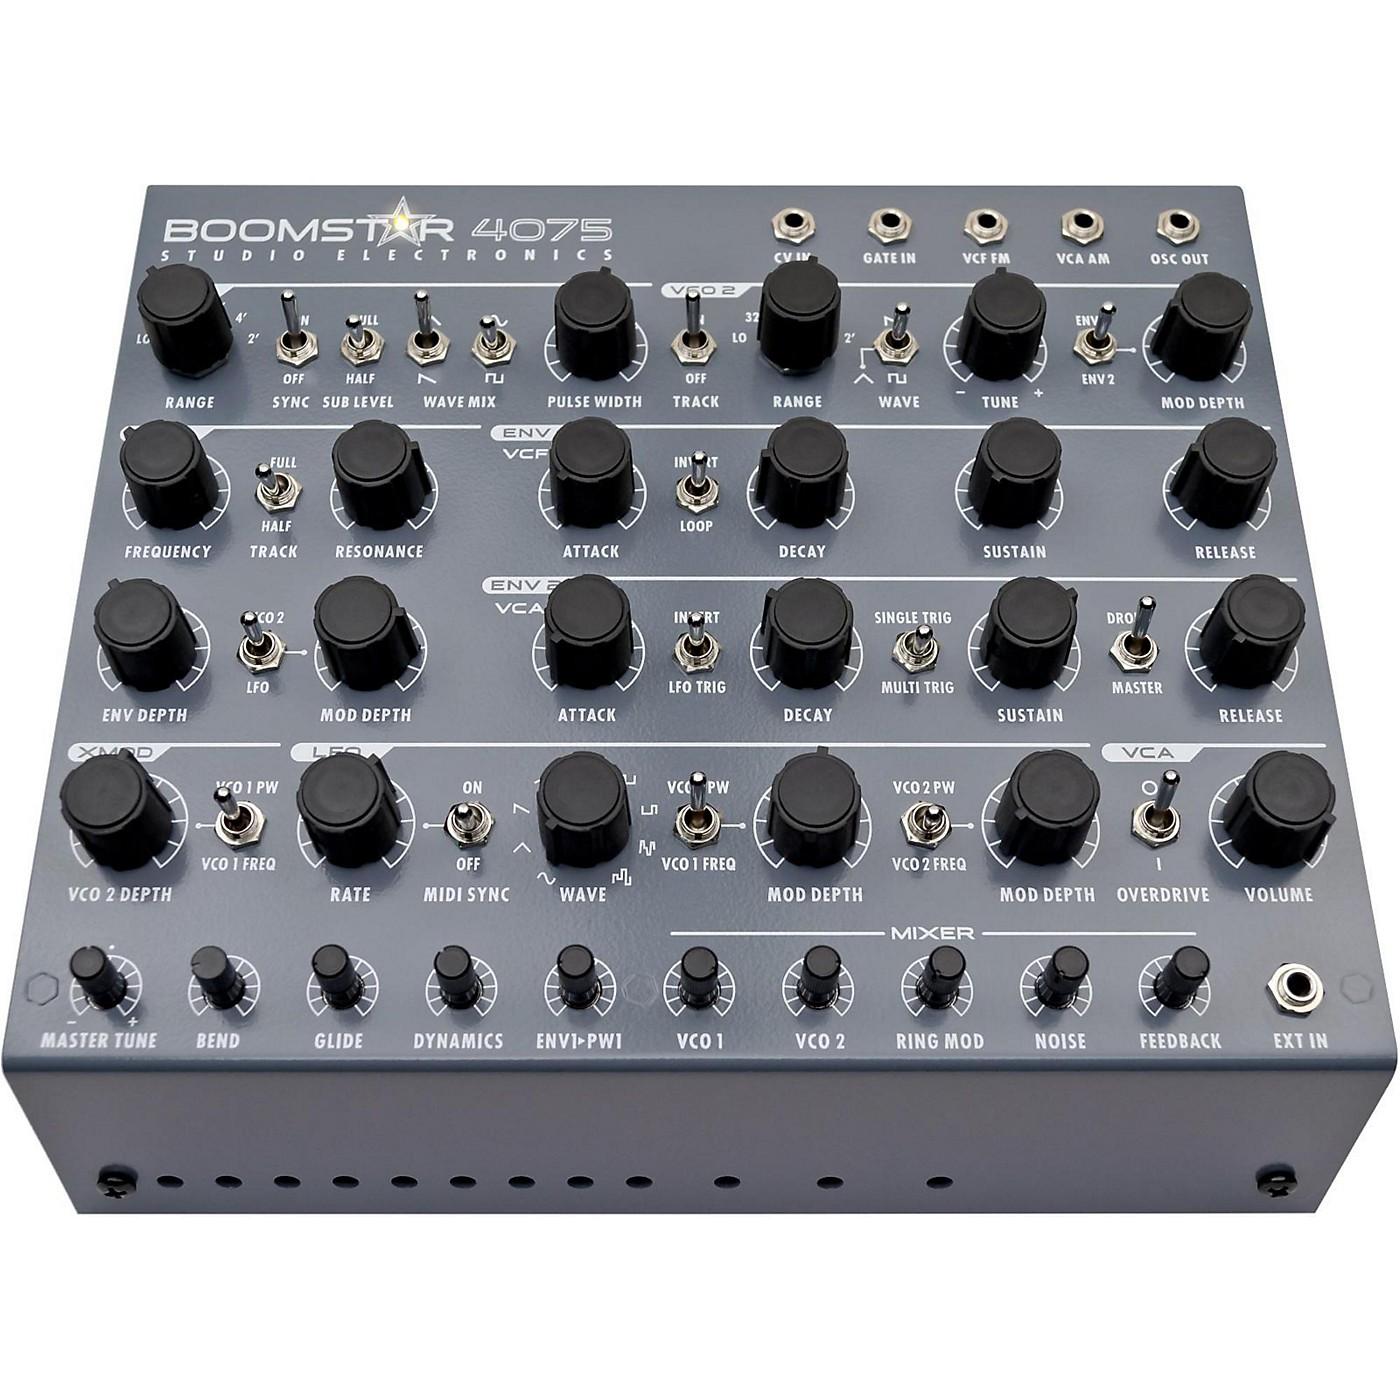 Studio Electronics Boomstar 4075 thumbnail